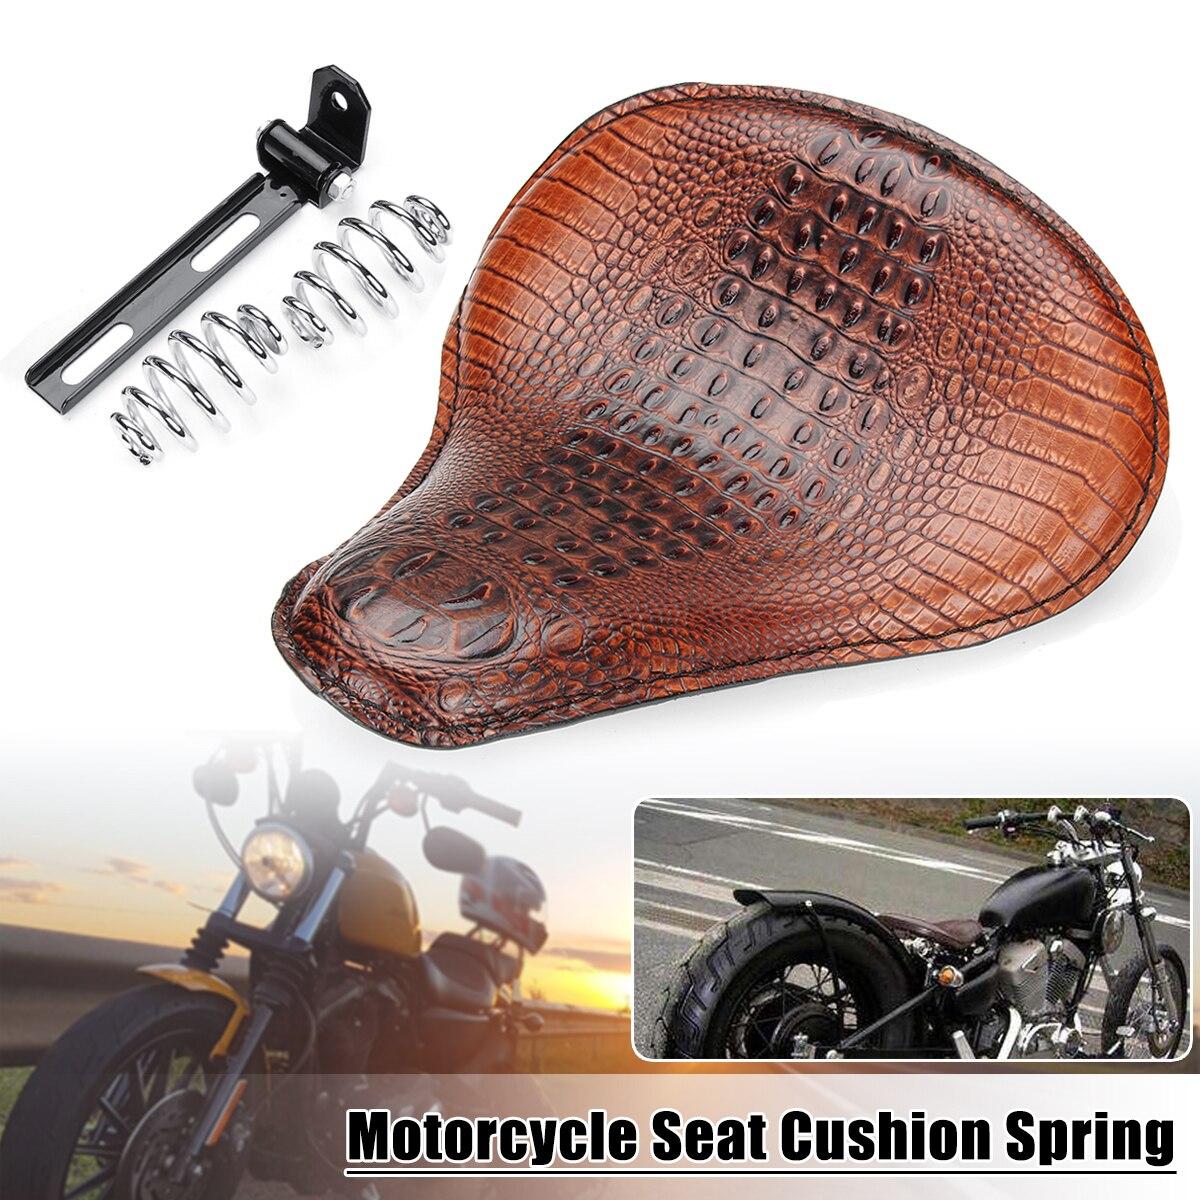 Universal Motorcycle Crocodile Leather Style Saddle Solo Seat Cushion Spring for Harley/Honda/Yamaha/Kawasaki universal motorcycle crocodile leather style saddle solo seat cushion spring for harley honda yamaha kawasaki